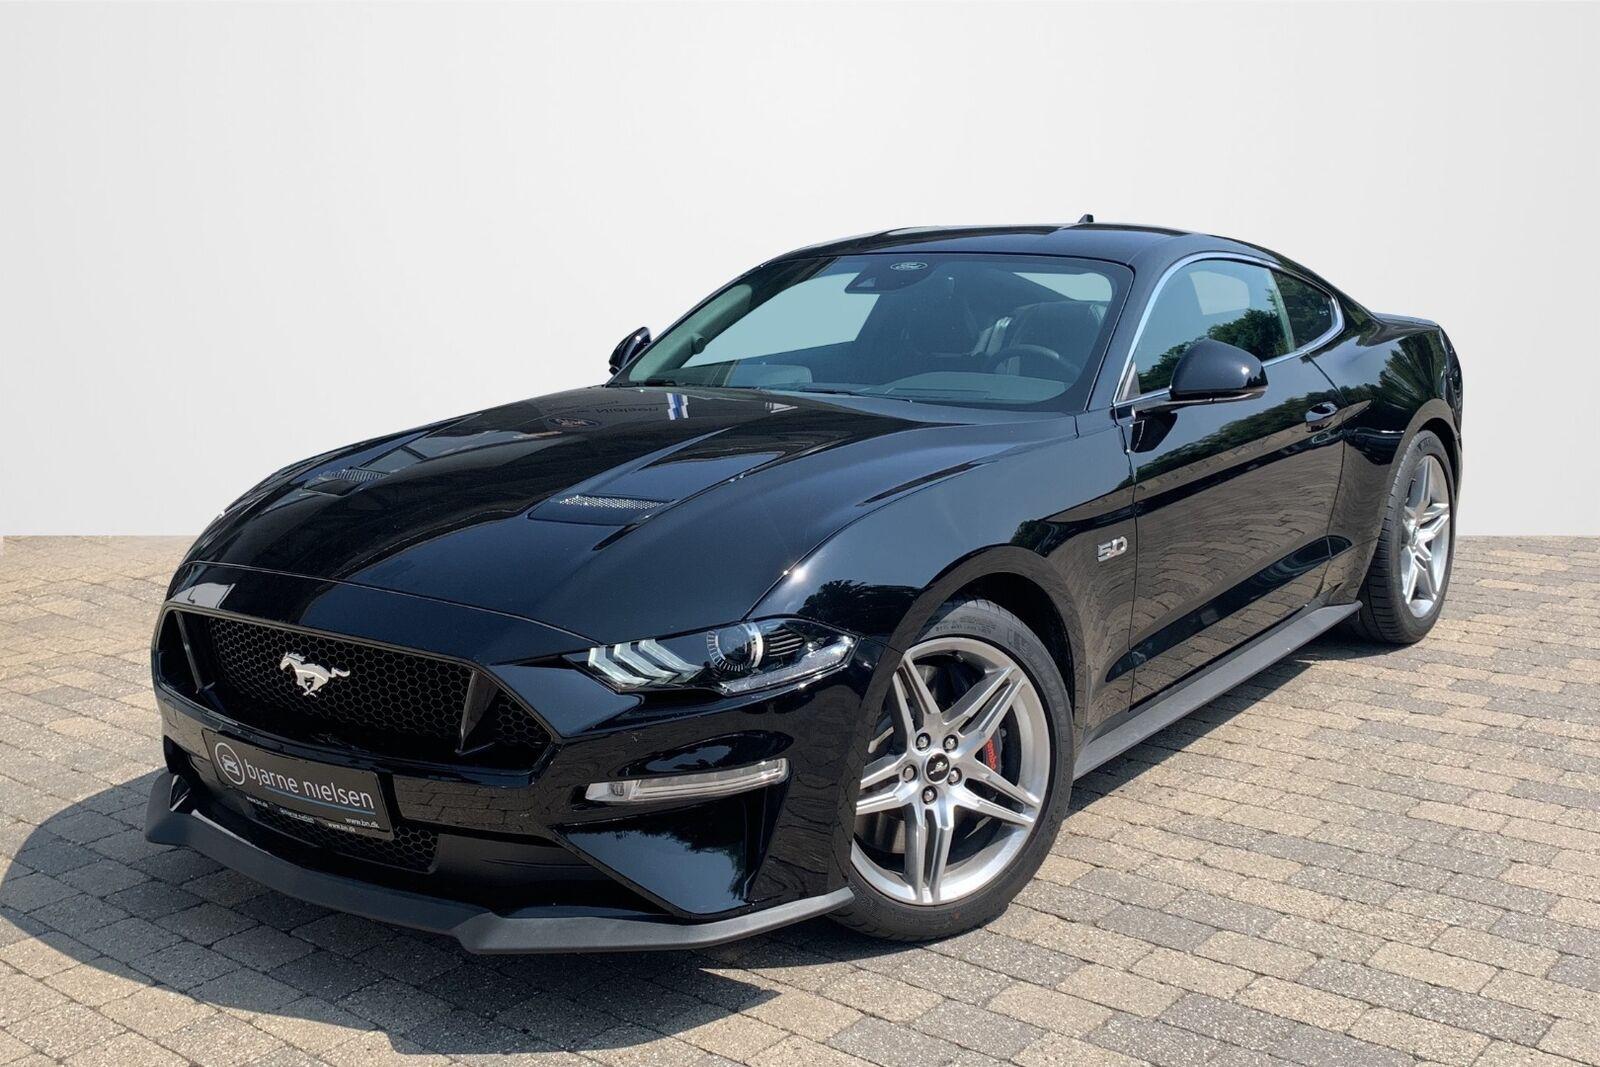 Ford Mustang 5,0 V8 GT Fastback aut. 2d - 799.900 kr.